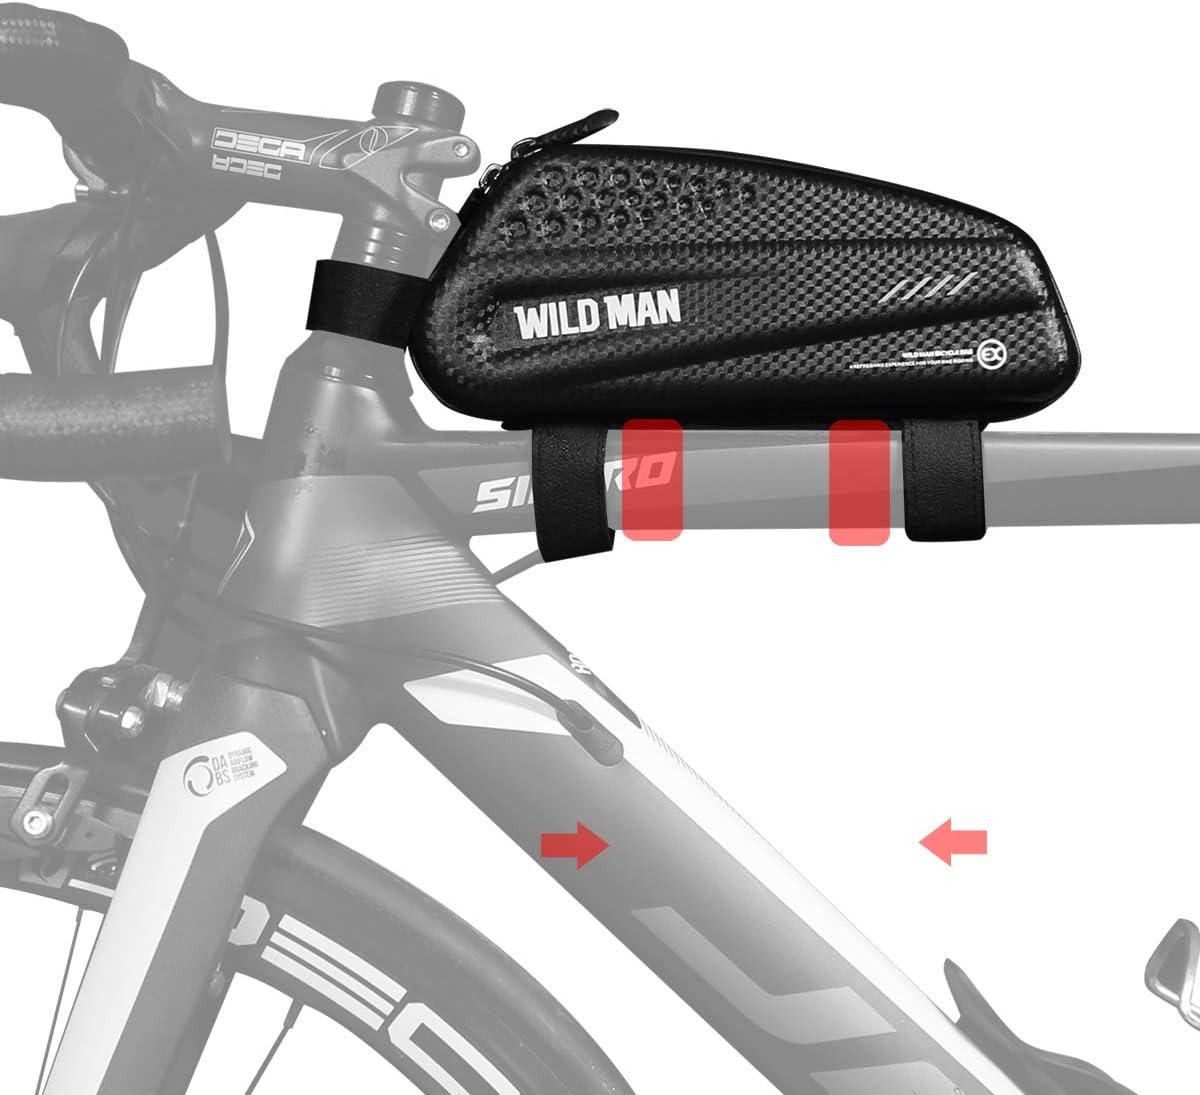 BWBIKE Bolsa de Almacenamiento de Bicicletas en Bicicleta Bolsa de Herramientas para Cuadro de Bicicletas 1L Negro Bolsa de Bicicleta de montaña Bolsa de Combustible de Ciclismo Superior